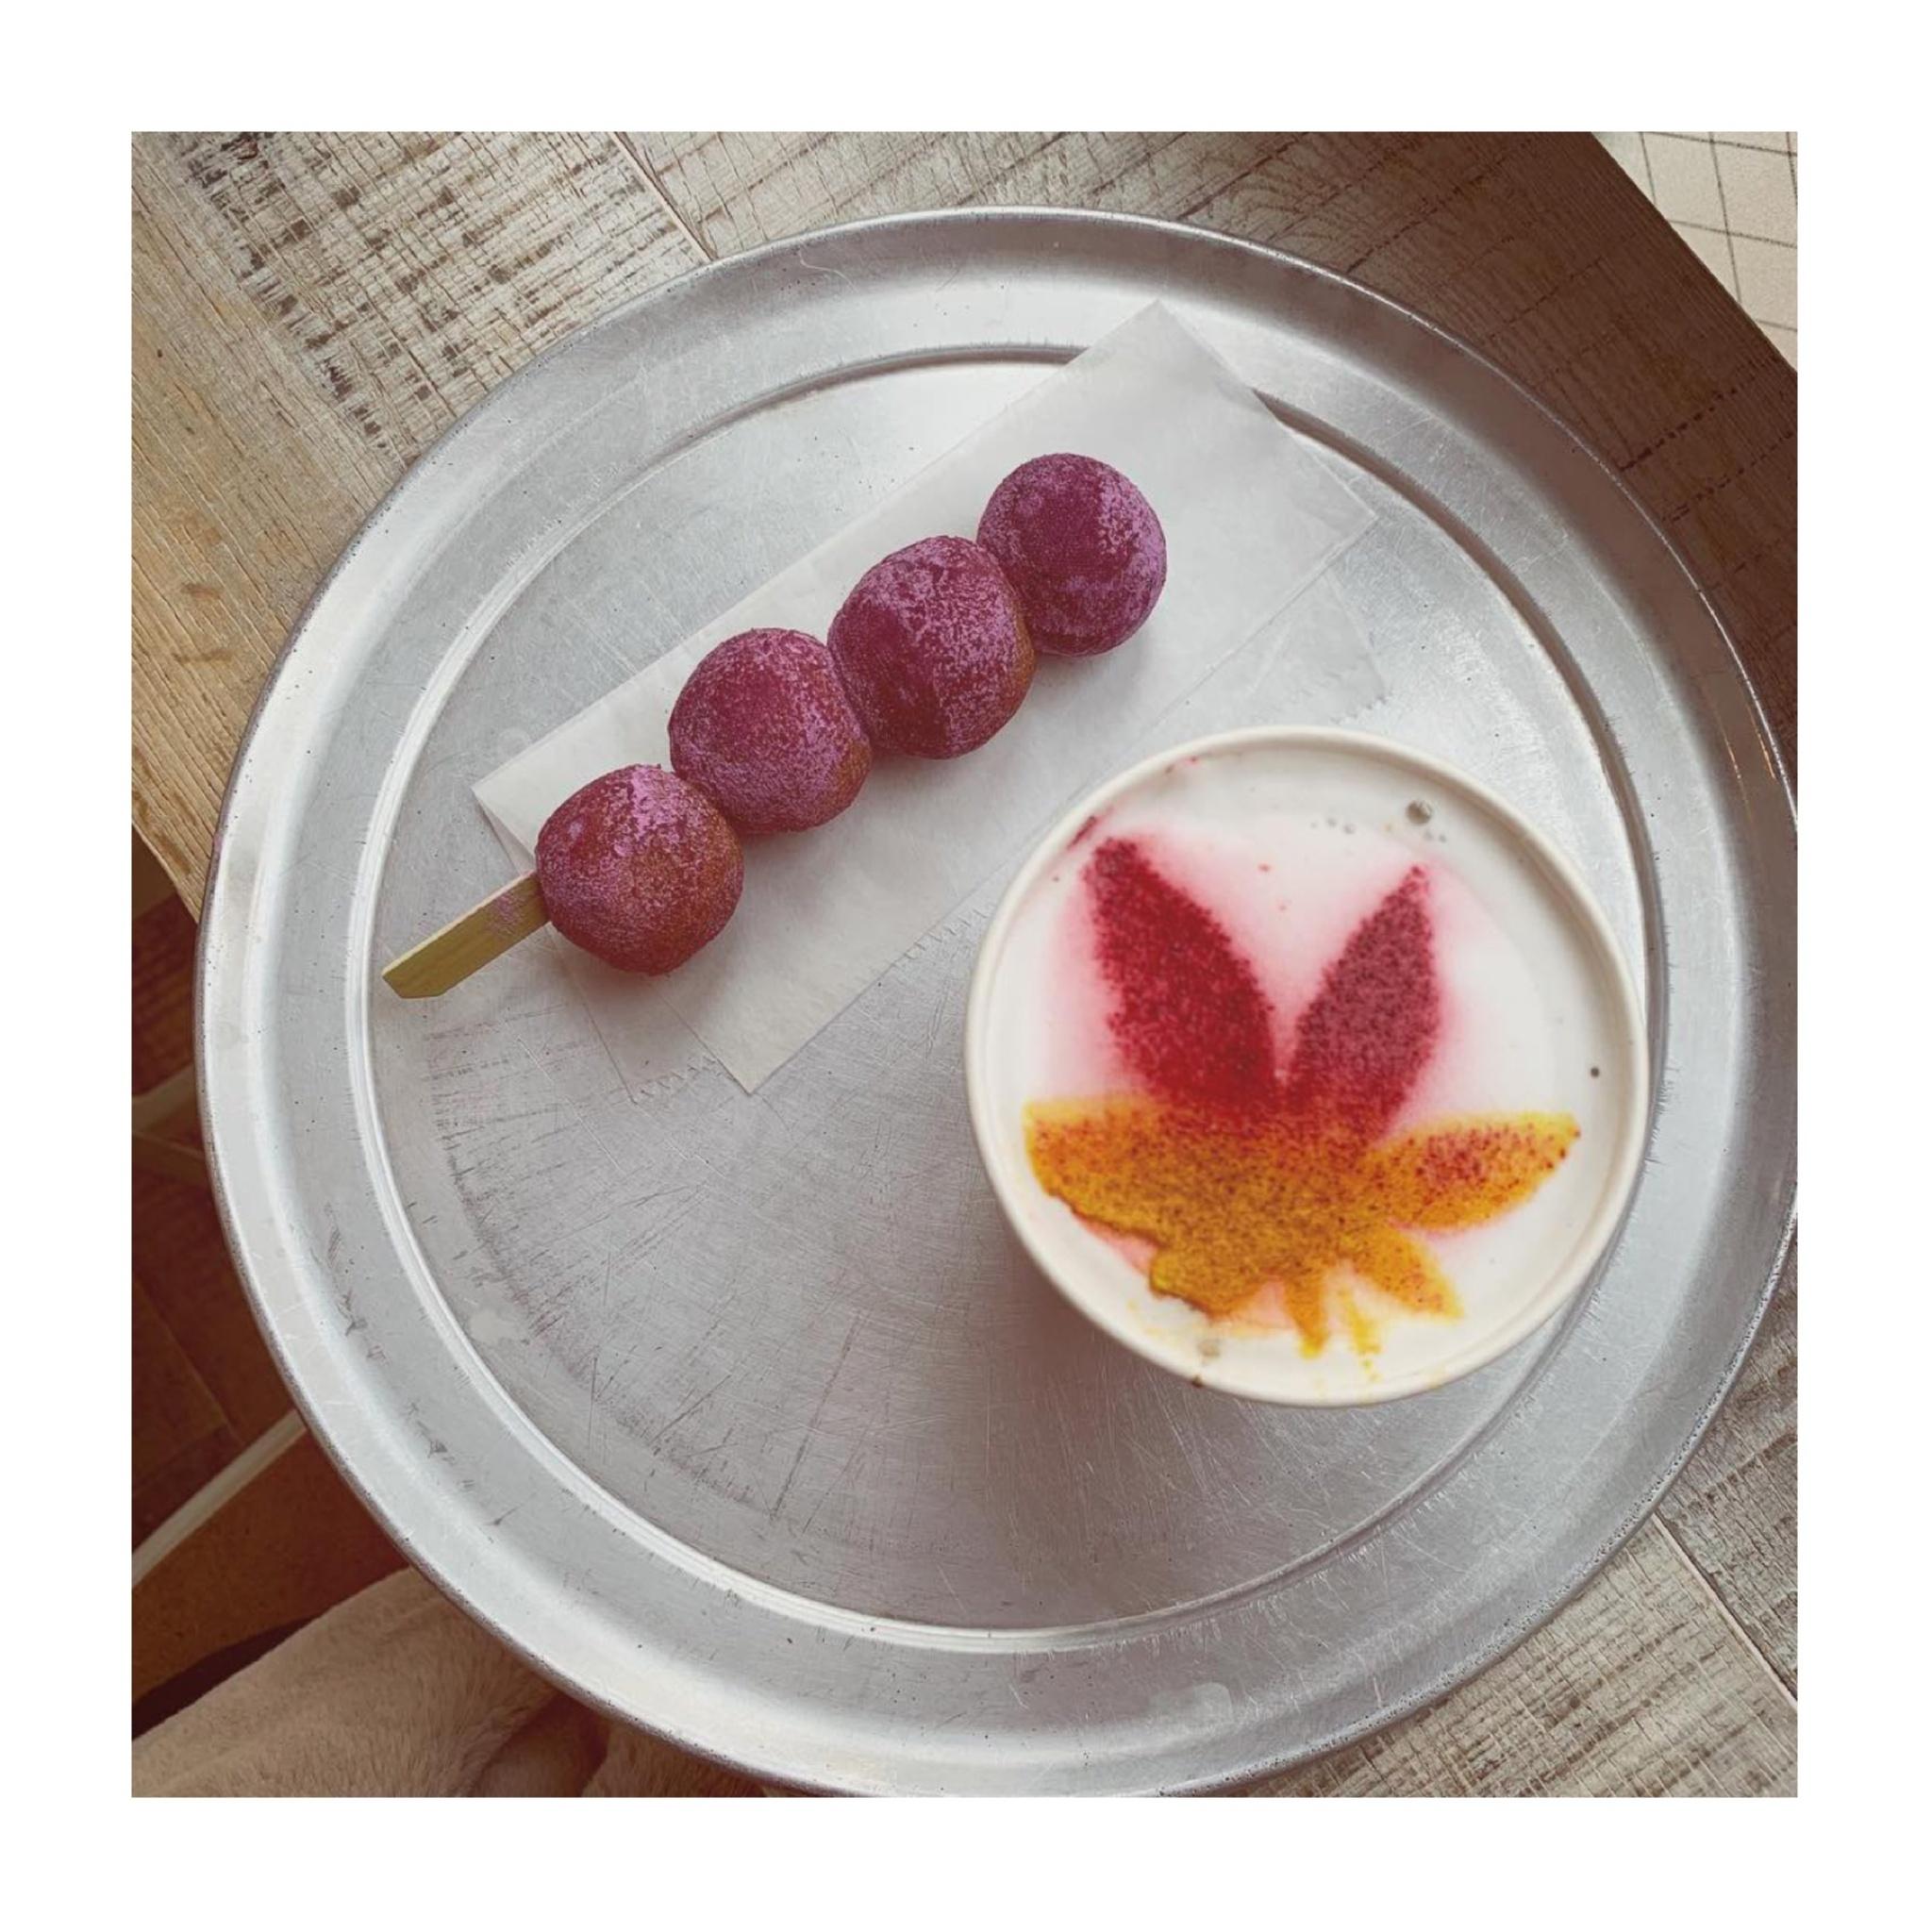 #19【#cafestagram】❤️:《東京•広尾》〜11/25まで期間限定!大人気カフェ『CANVAS TOKYO』で飲める紅葉のカラーラテをチェック☻_4